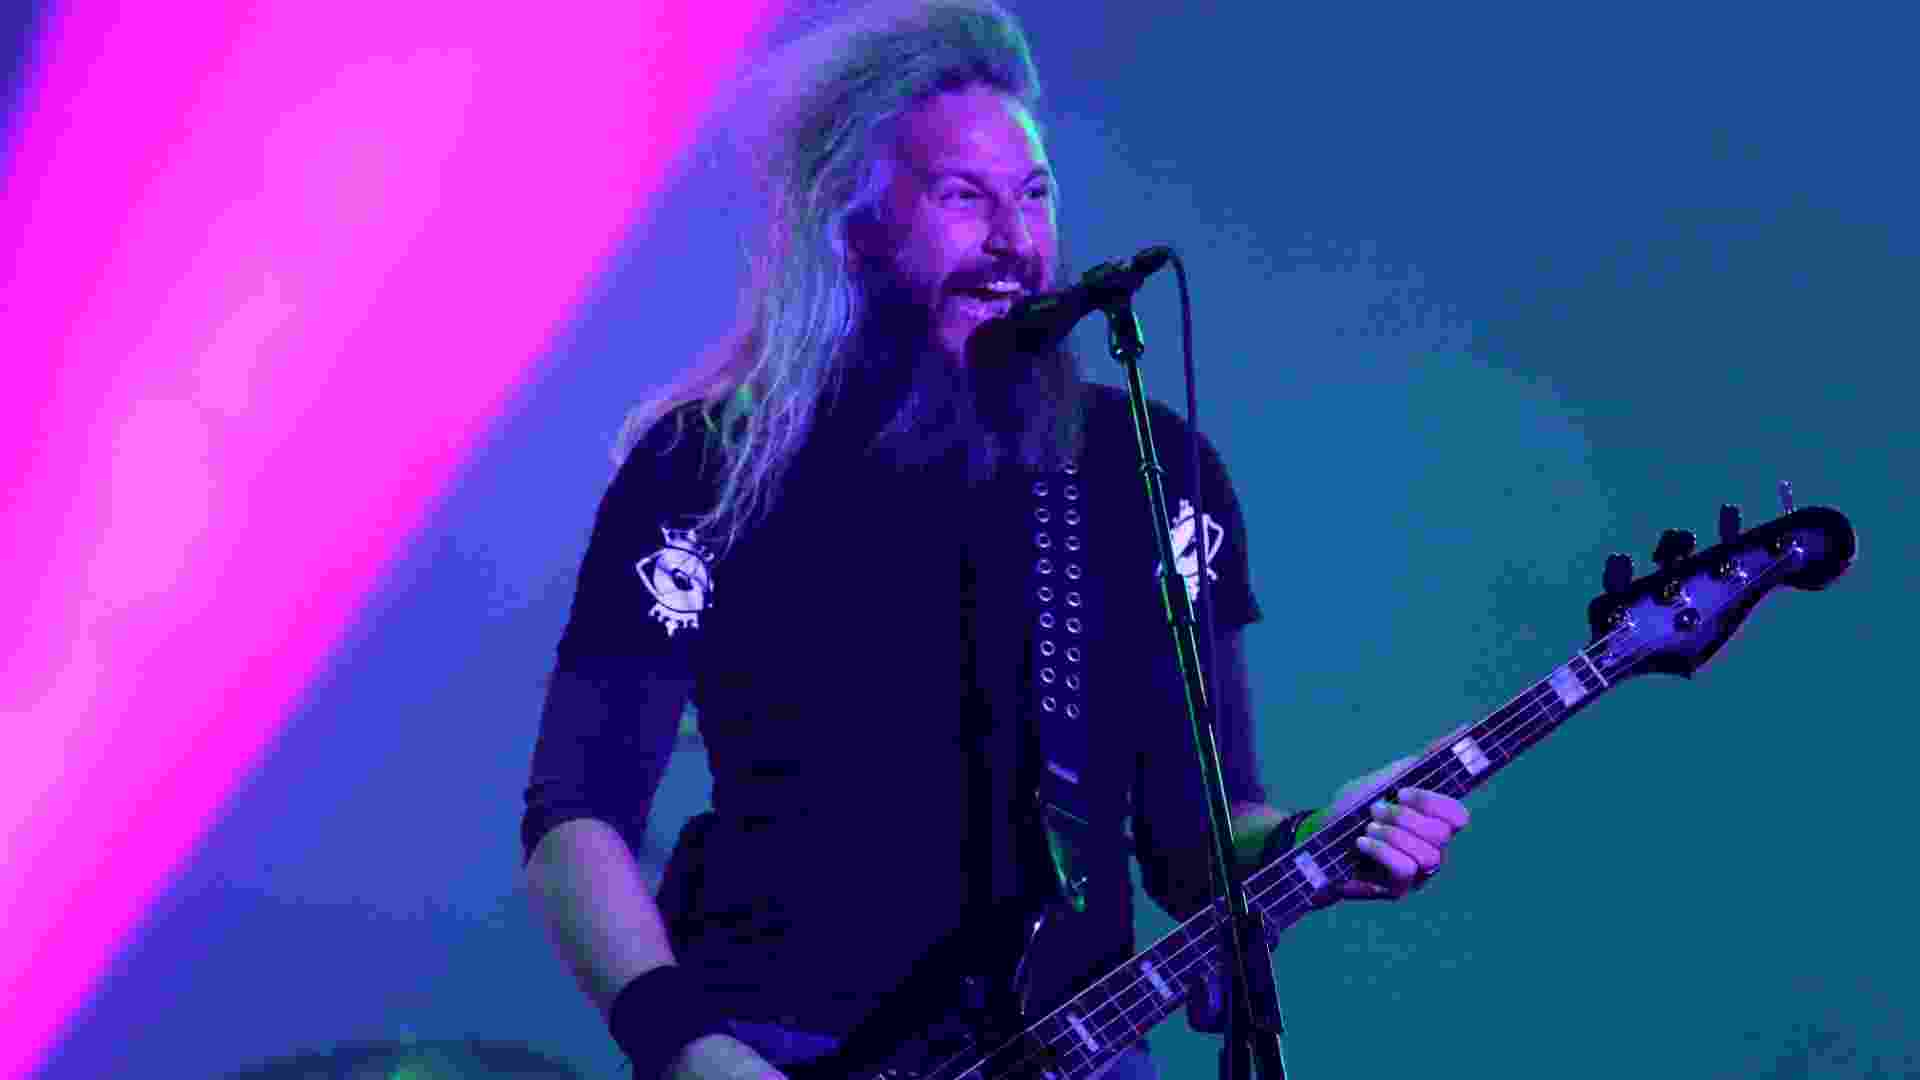 25.set.2015 - A banda americana Mastodon, representando o new wave heavy metal, se apresenta no palco Mundo, durante o quinto dia do festival Rock in Rio 2015. - Fernando Maia/UOL